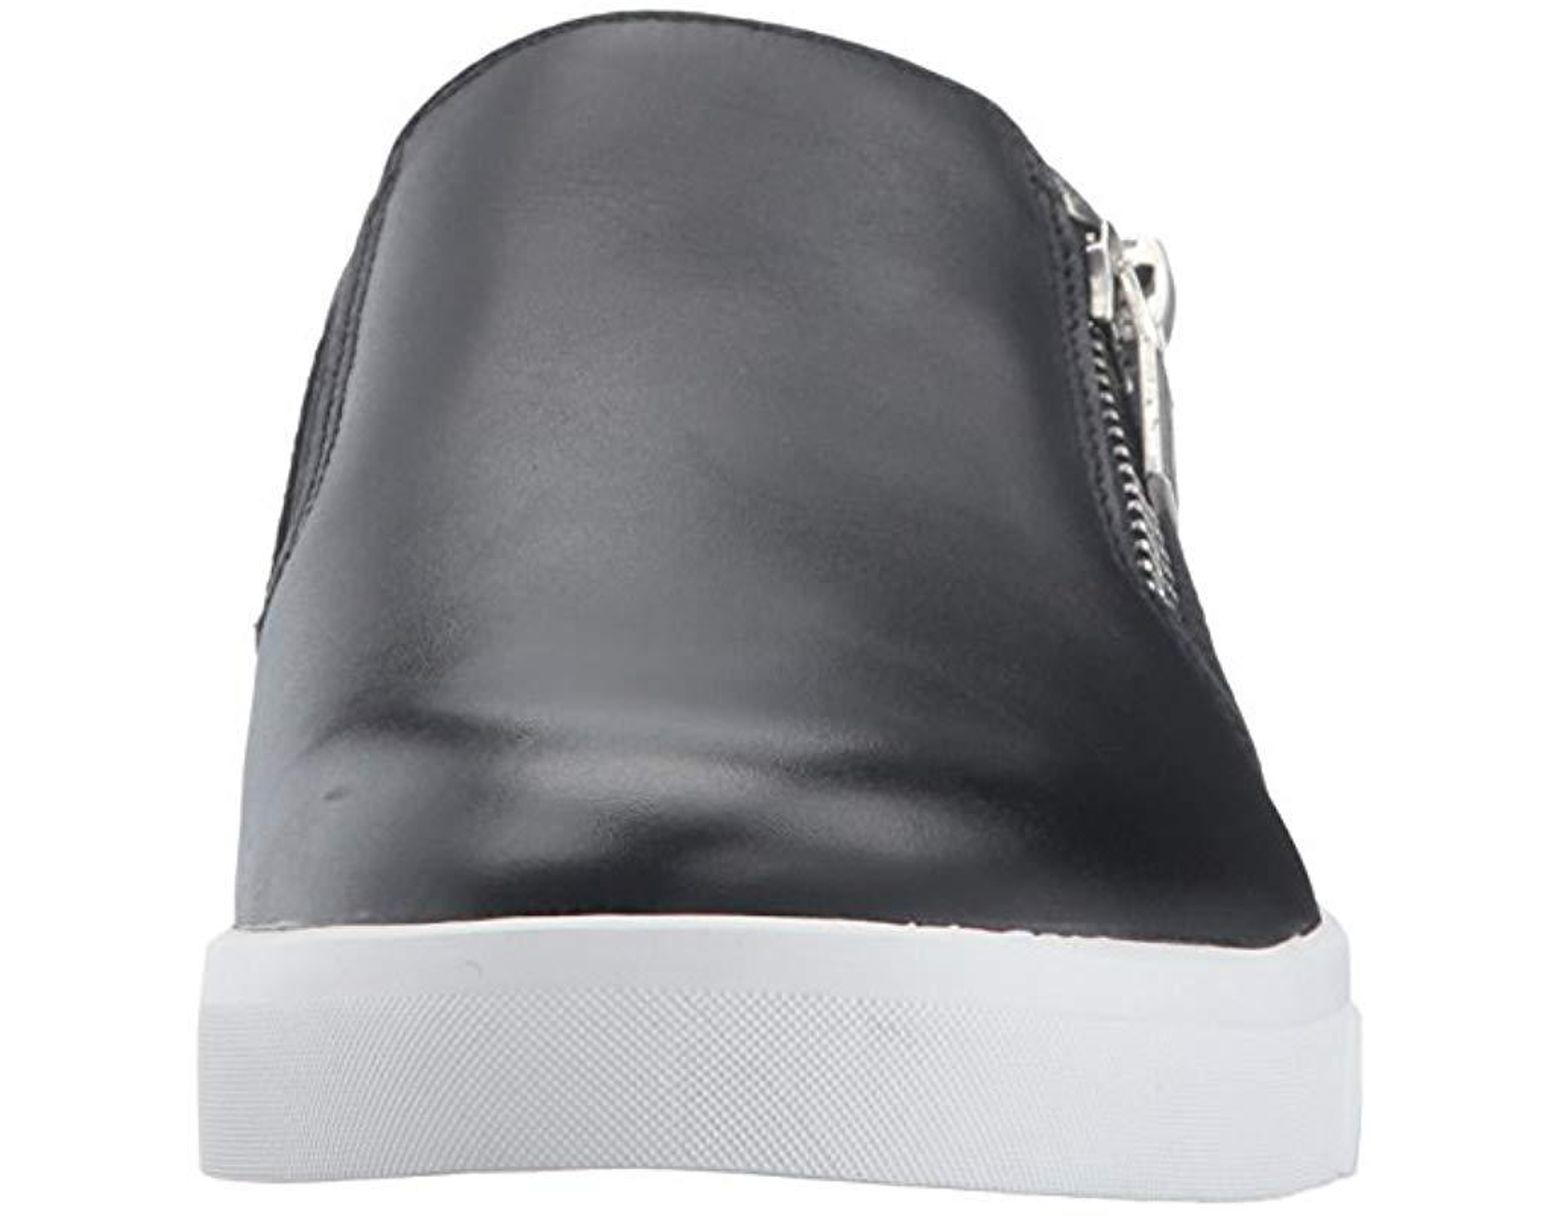 a1204100e587d Men's Black Ibiza Np Smth Clf/ebms Sft Lthr Fashion Sneaker